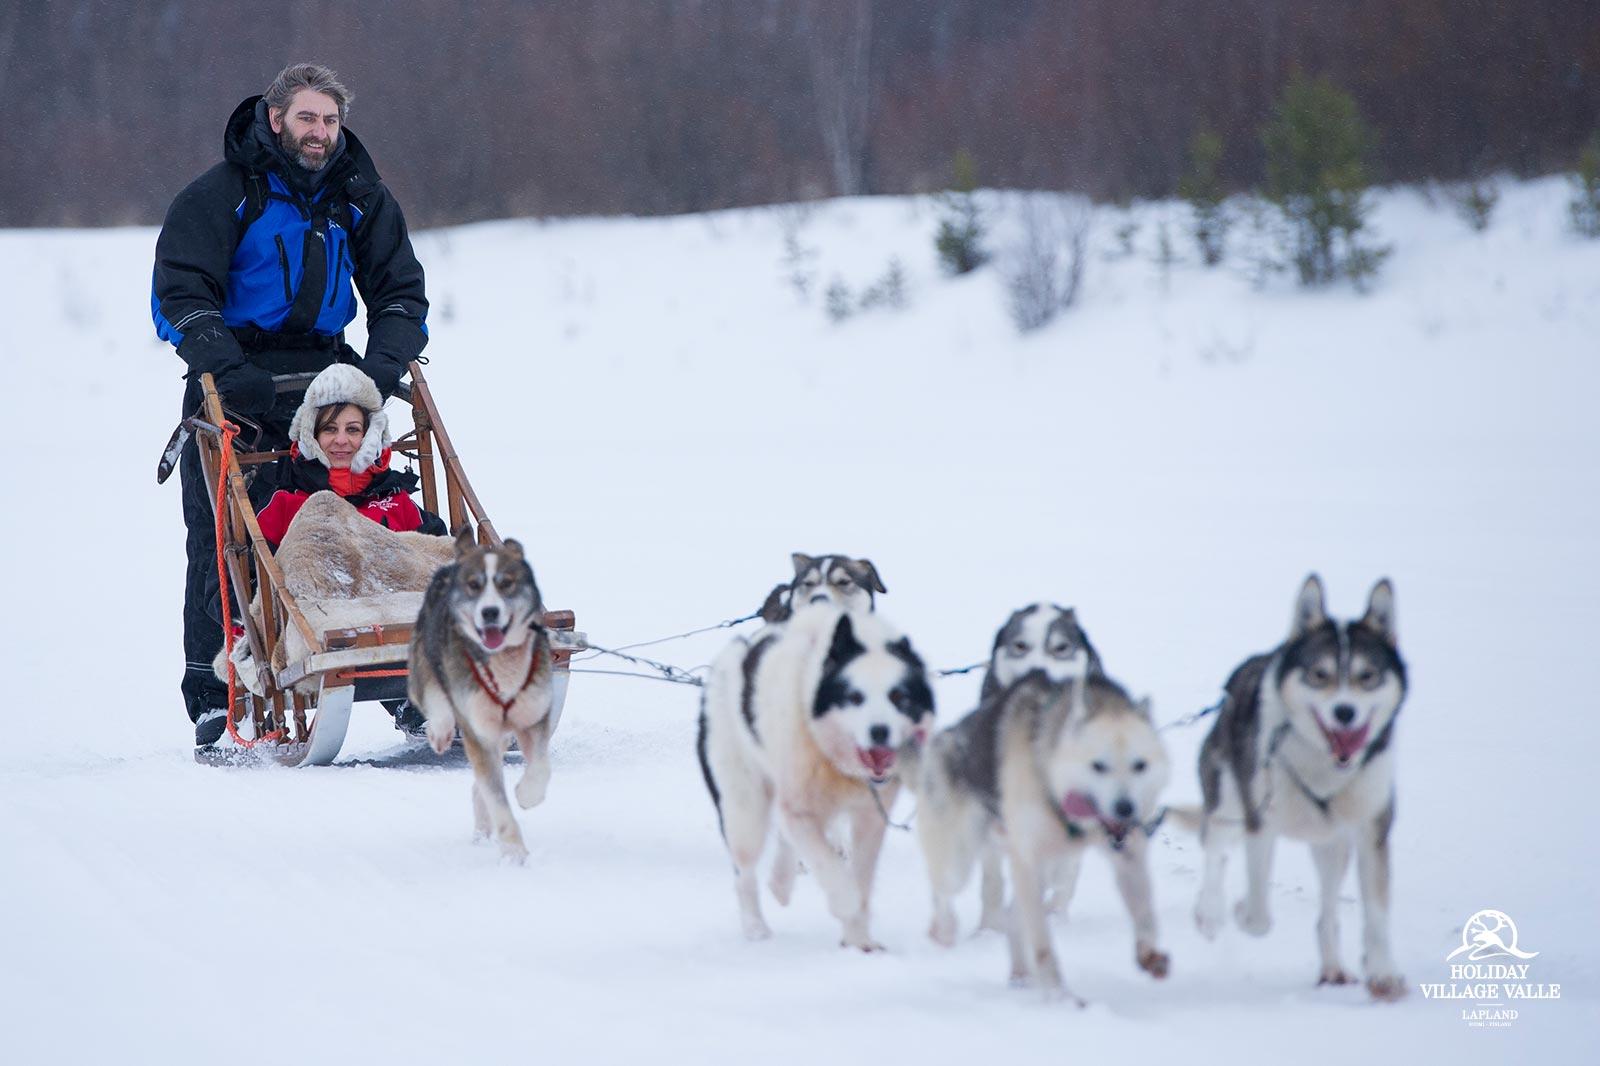 gallery-winter-adventure-holiday-village-valle-lapland-016